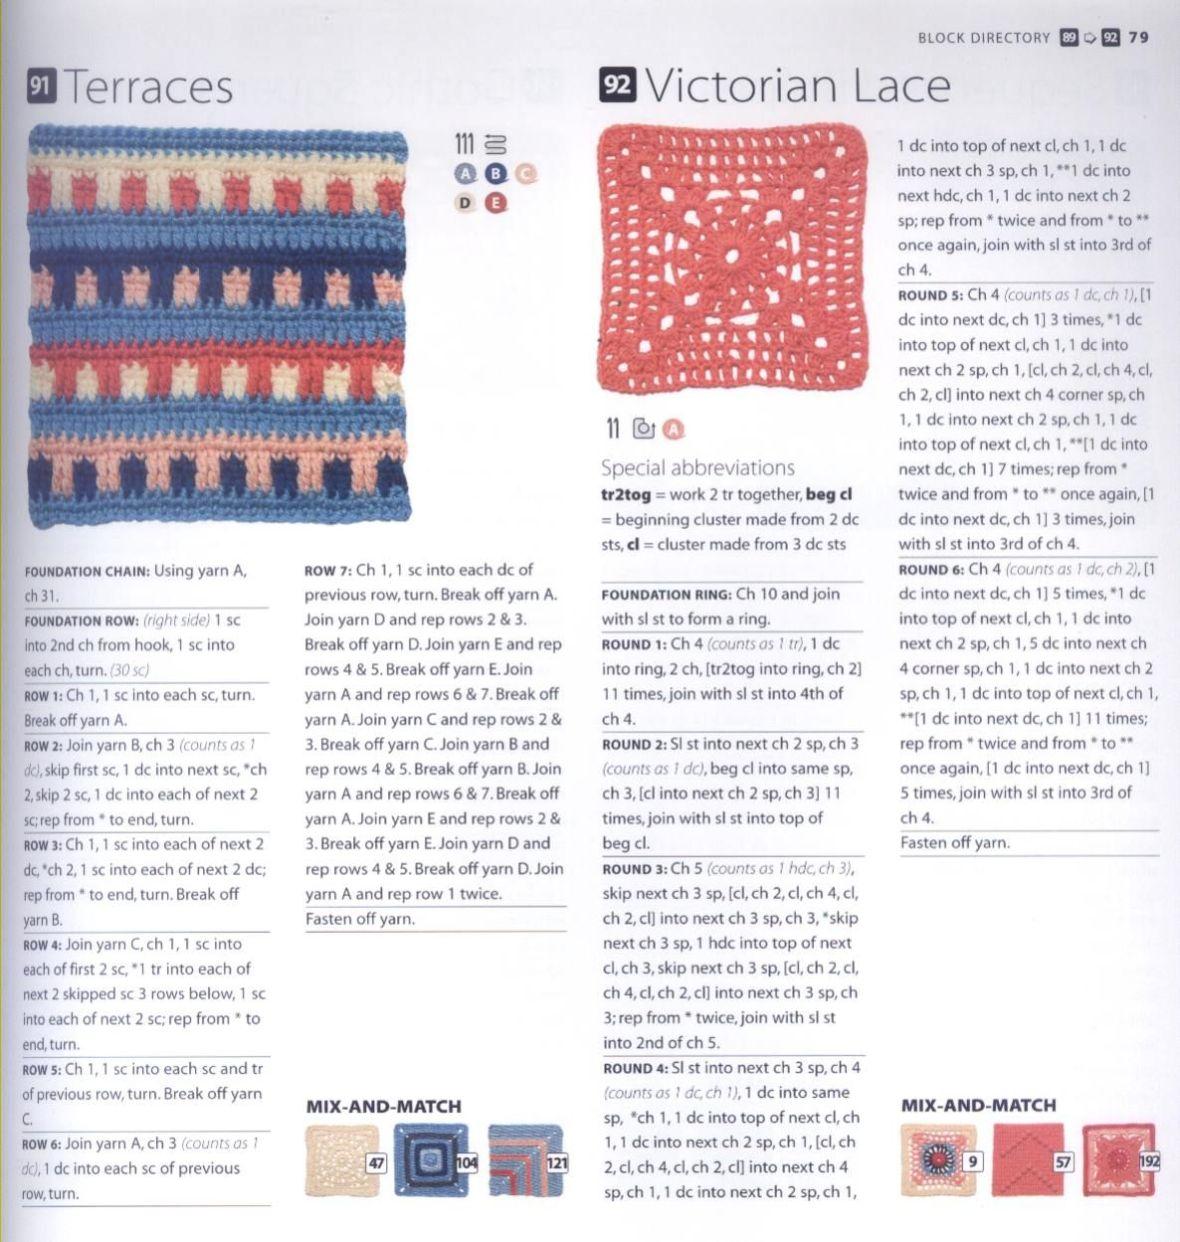 200 Crocheted Blocks for blankets, throws & Afghans 079